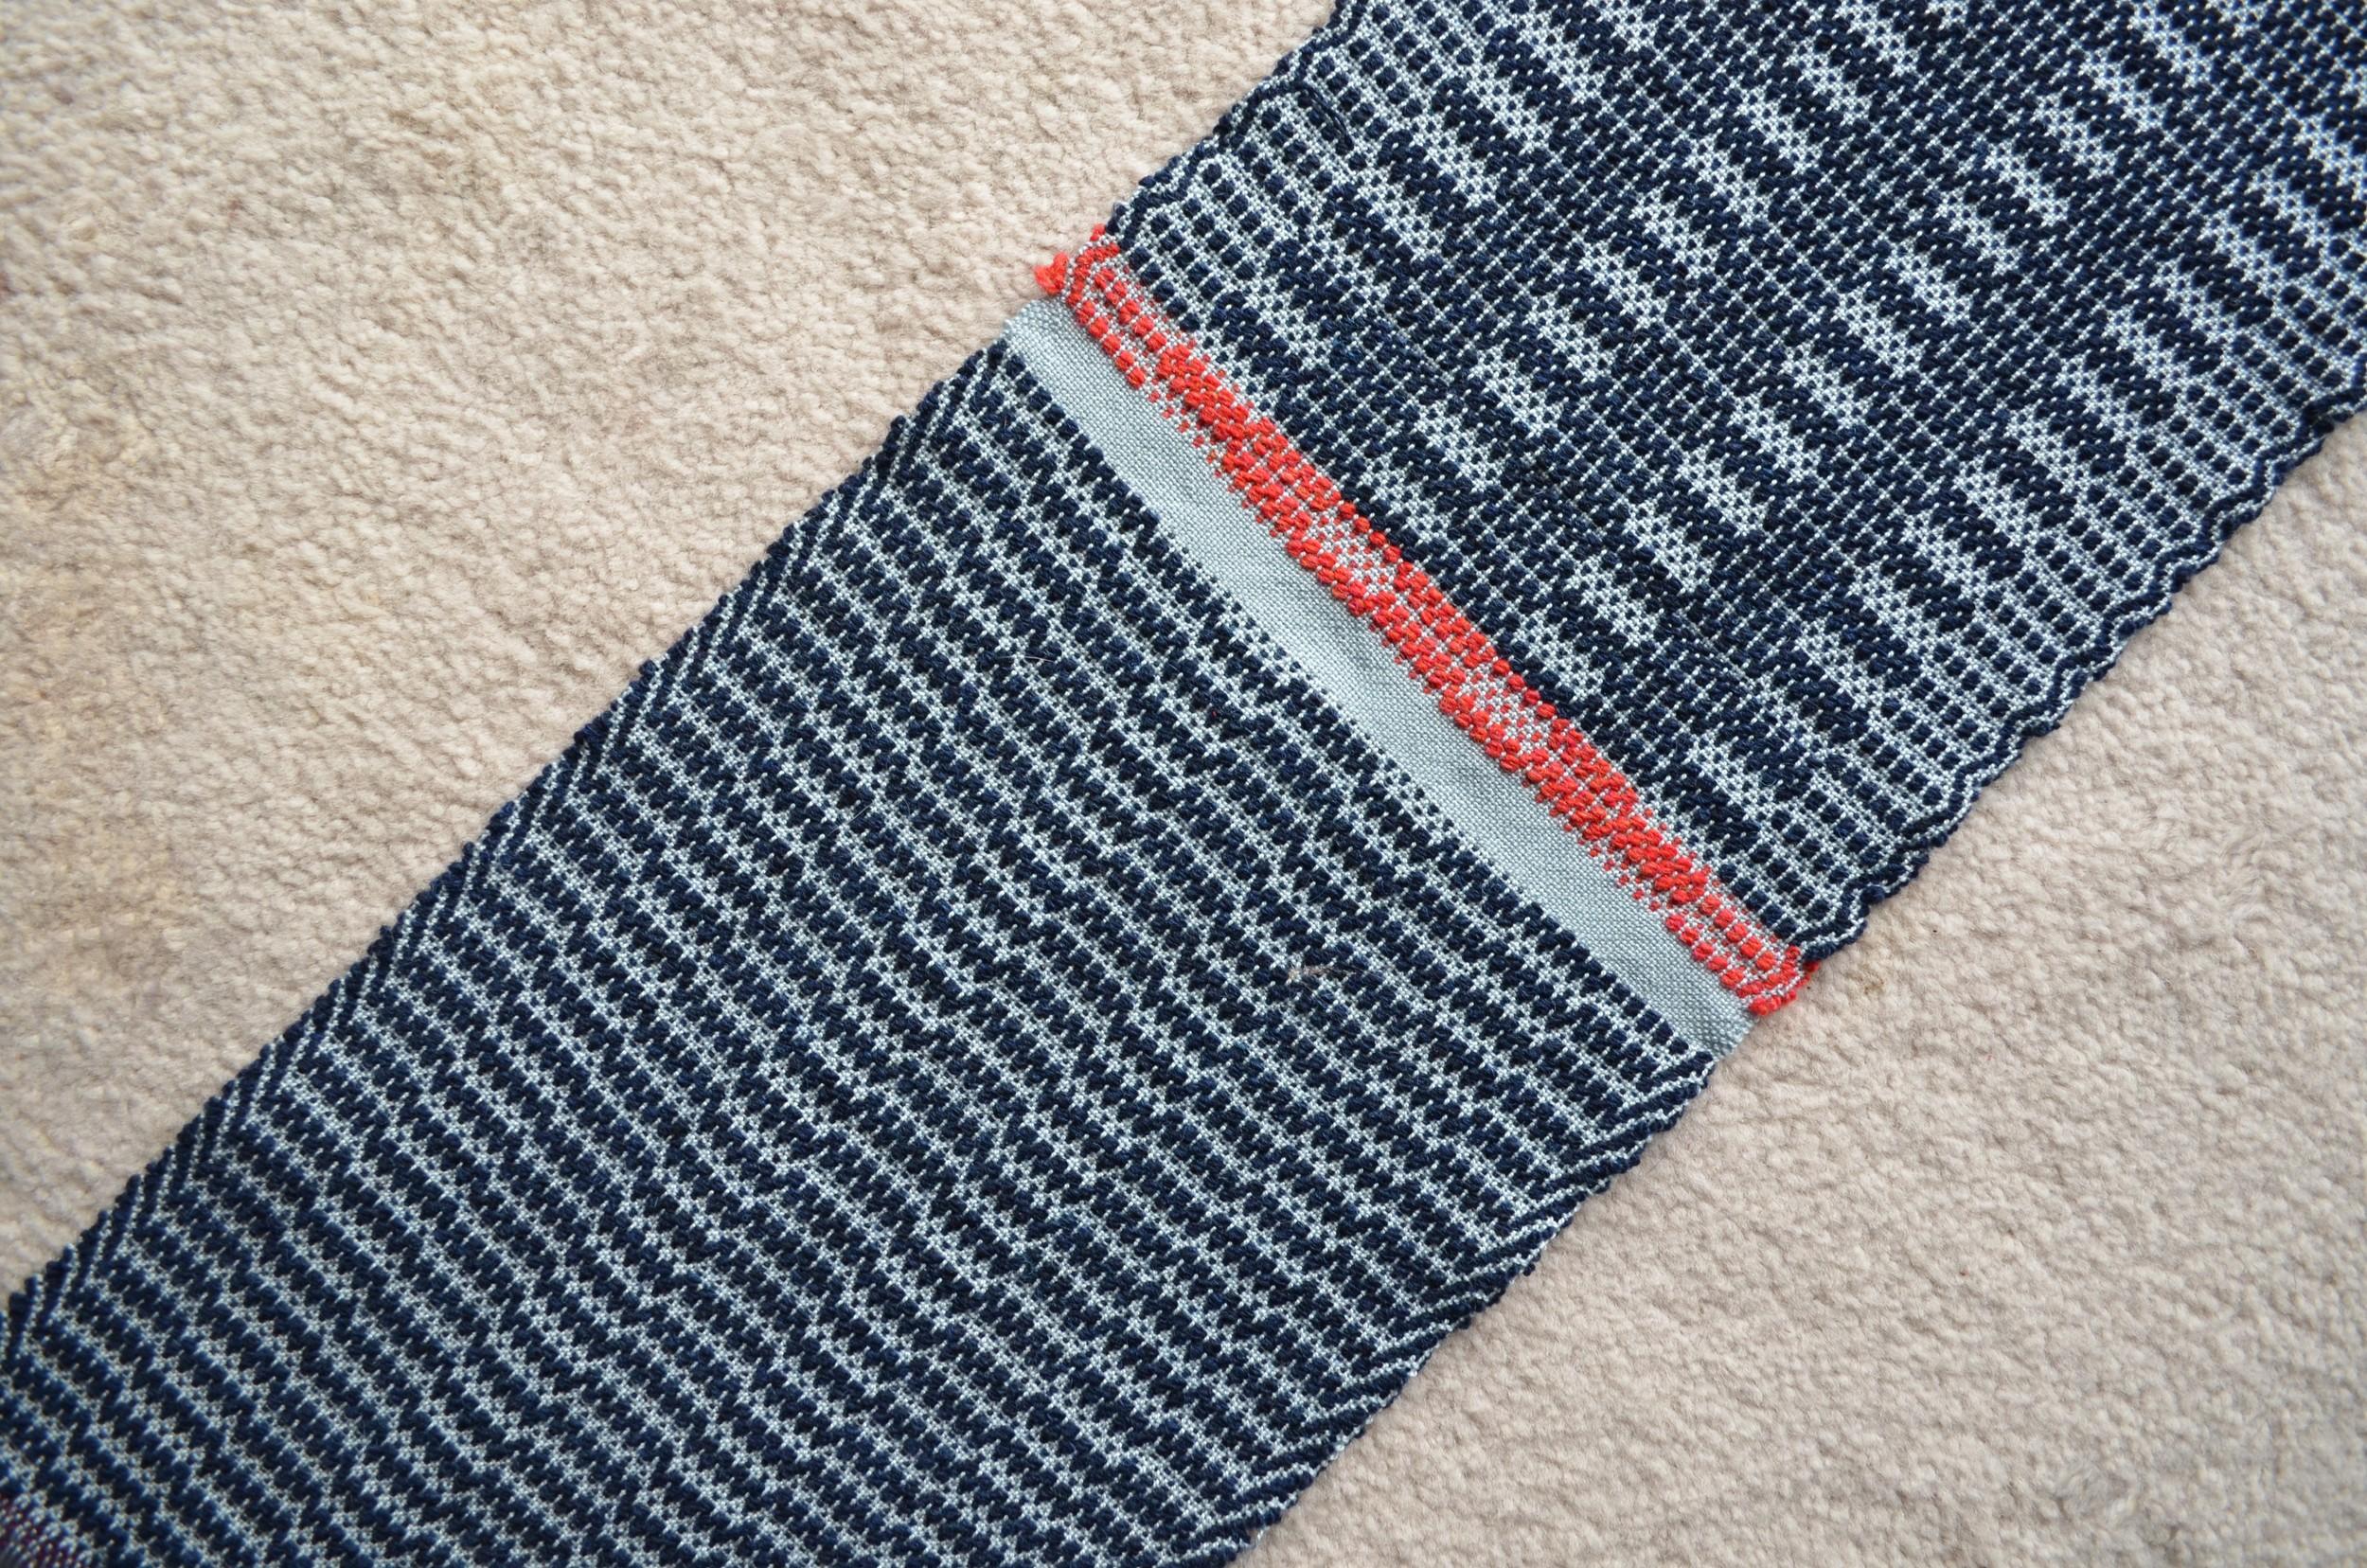 Crackle Twill Weaving / warporweft.com